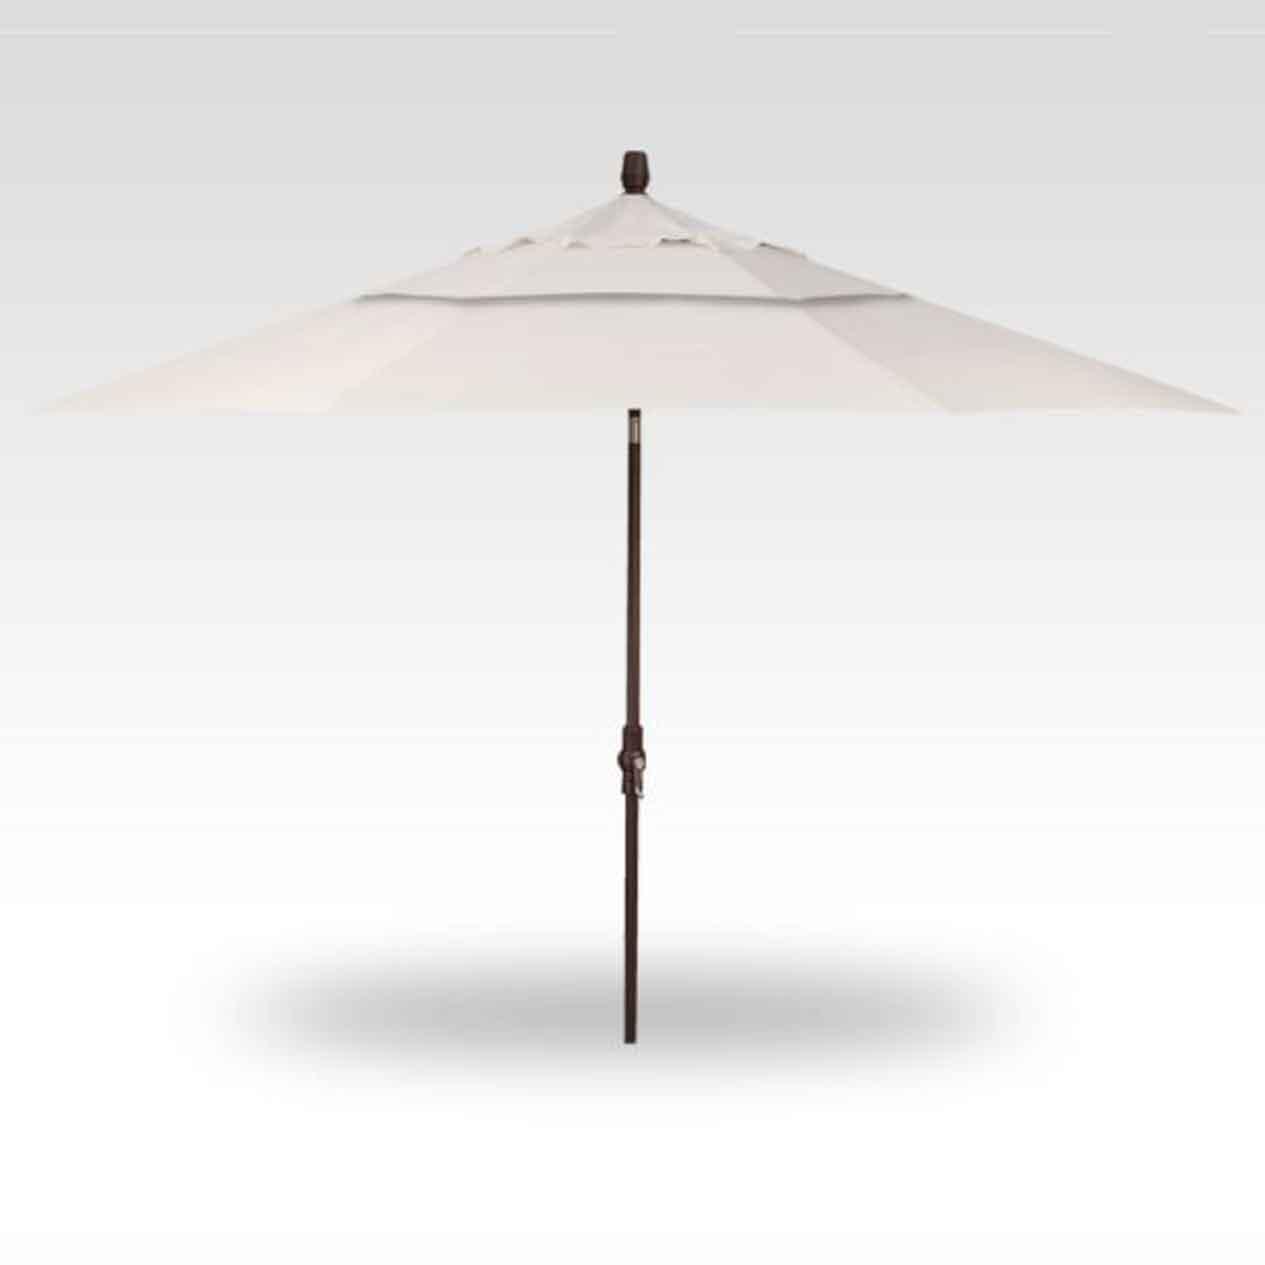 11' Collar Tilt Market Umbrella - Canvas